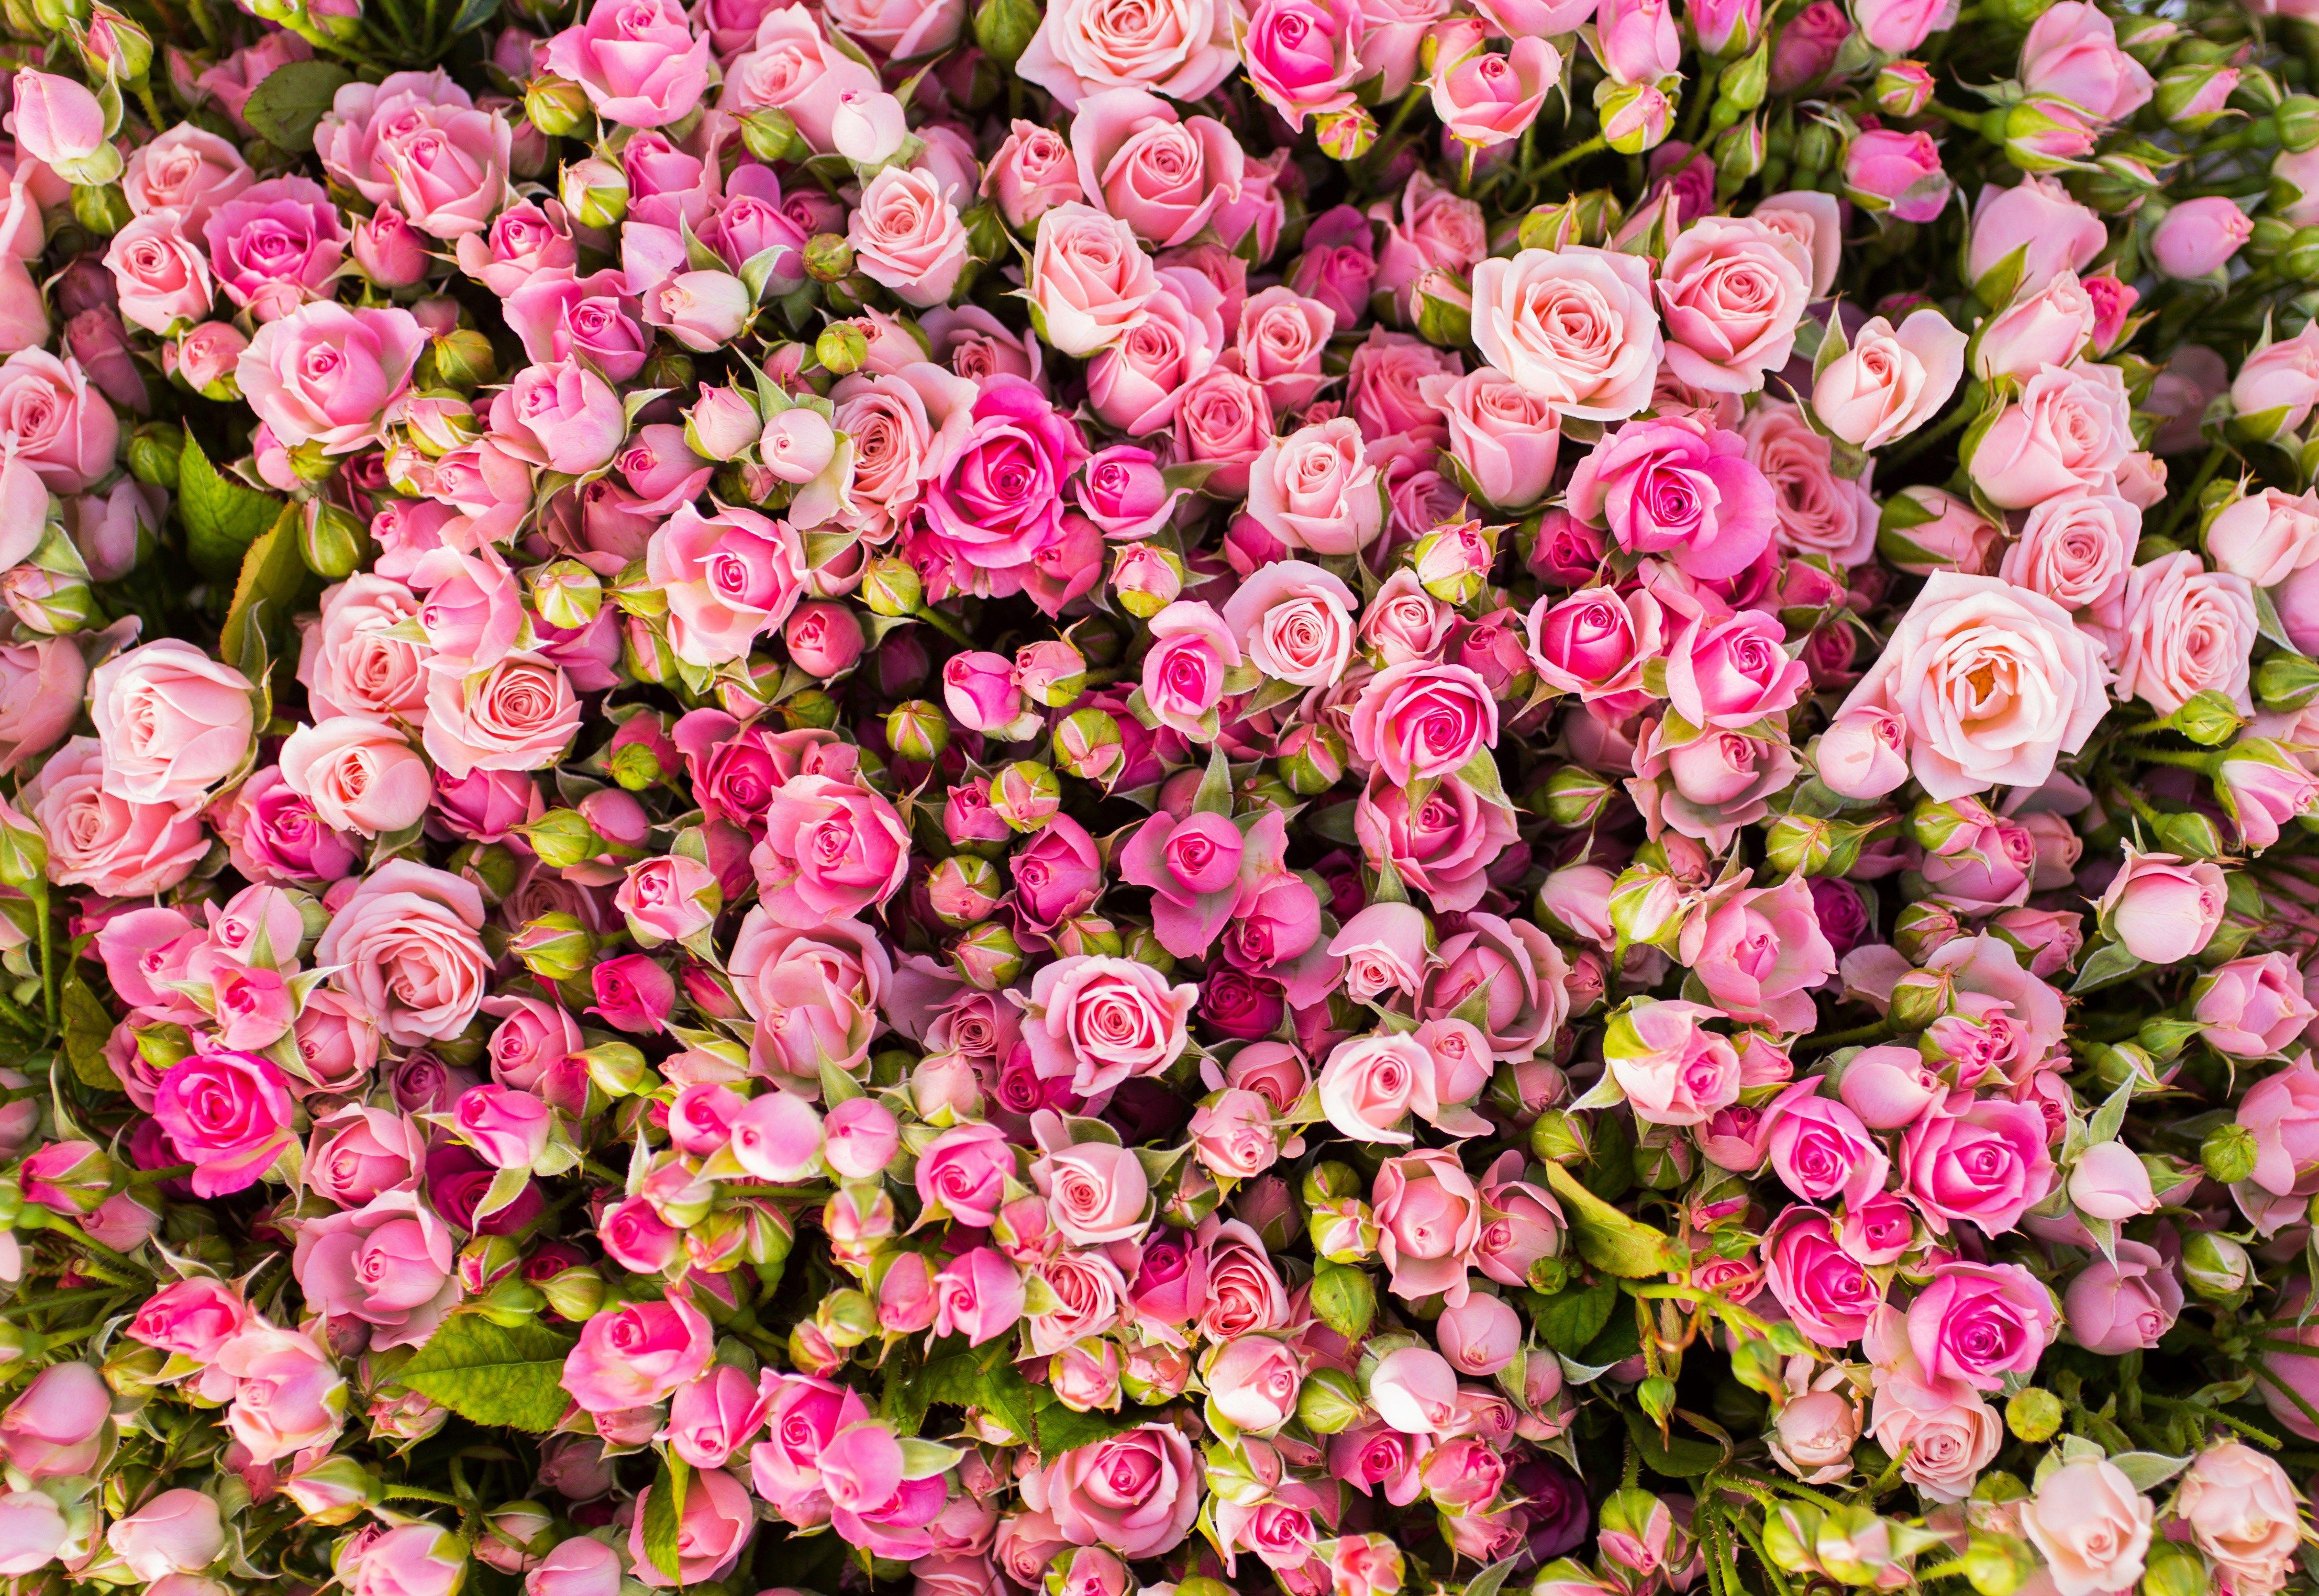 Haven Kingsman Rose Macbook Wallpapers Hd 4429x3049 Px Rose